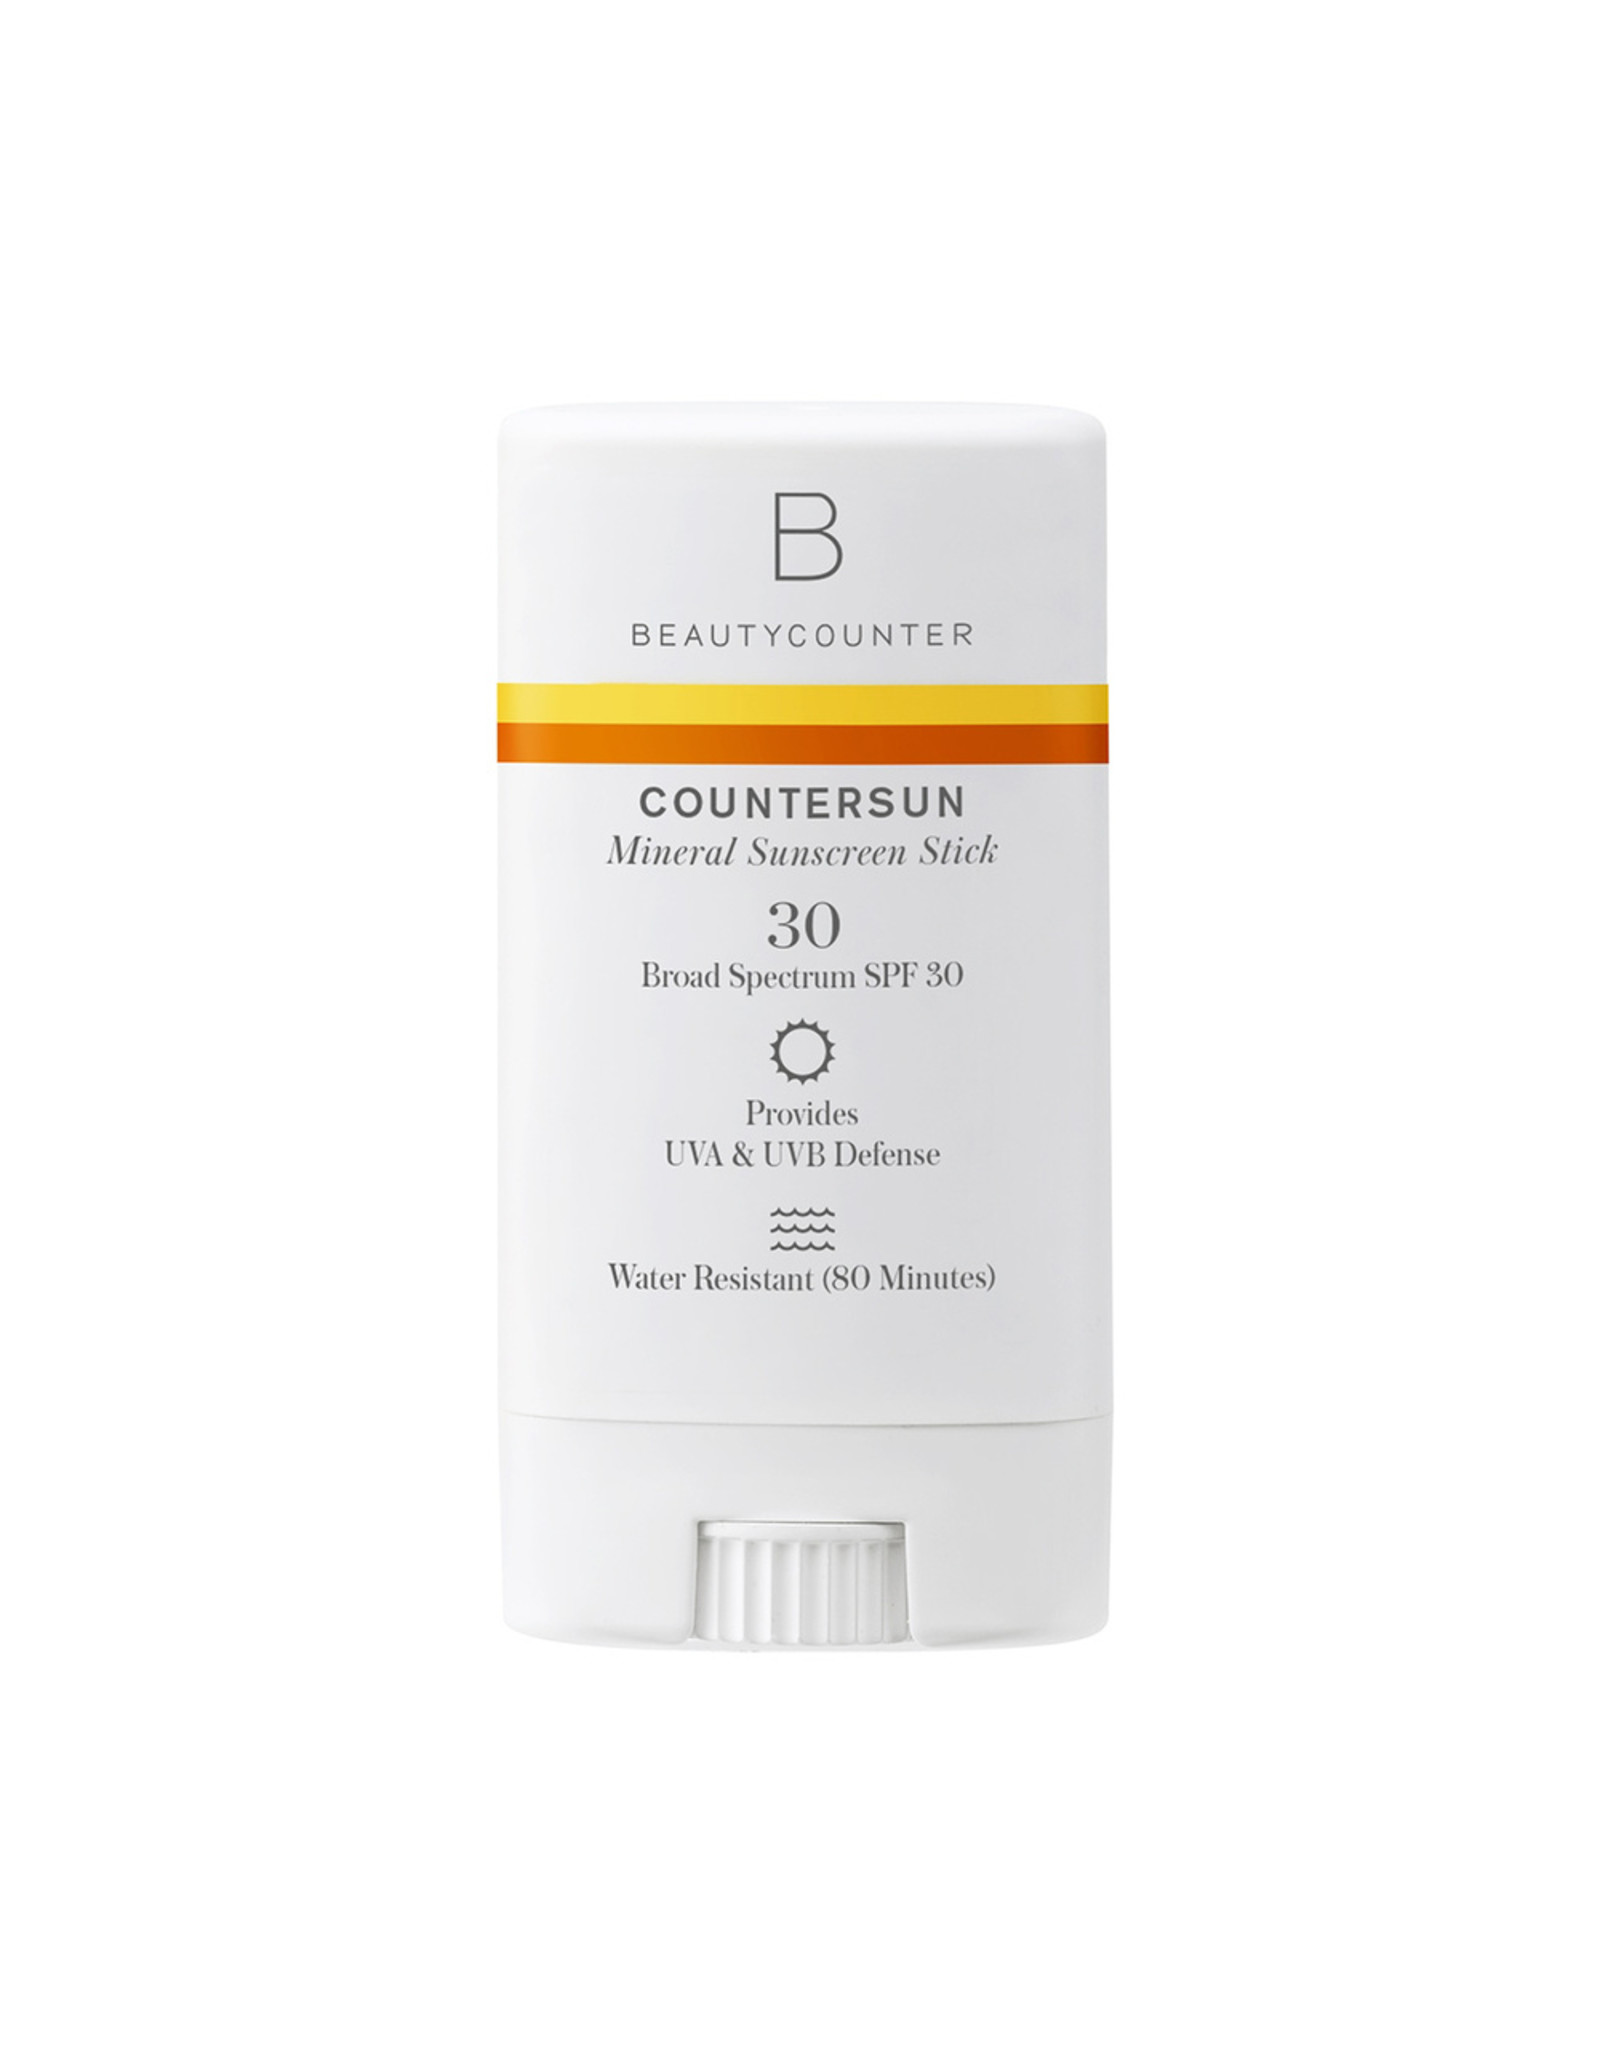 Beautycounter Beautycounter Countersun Mineral Sunscreen Stick SPF 30